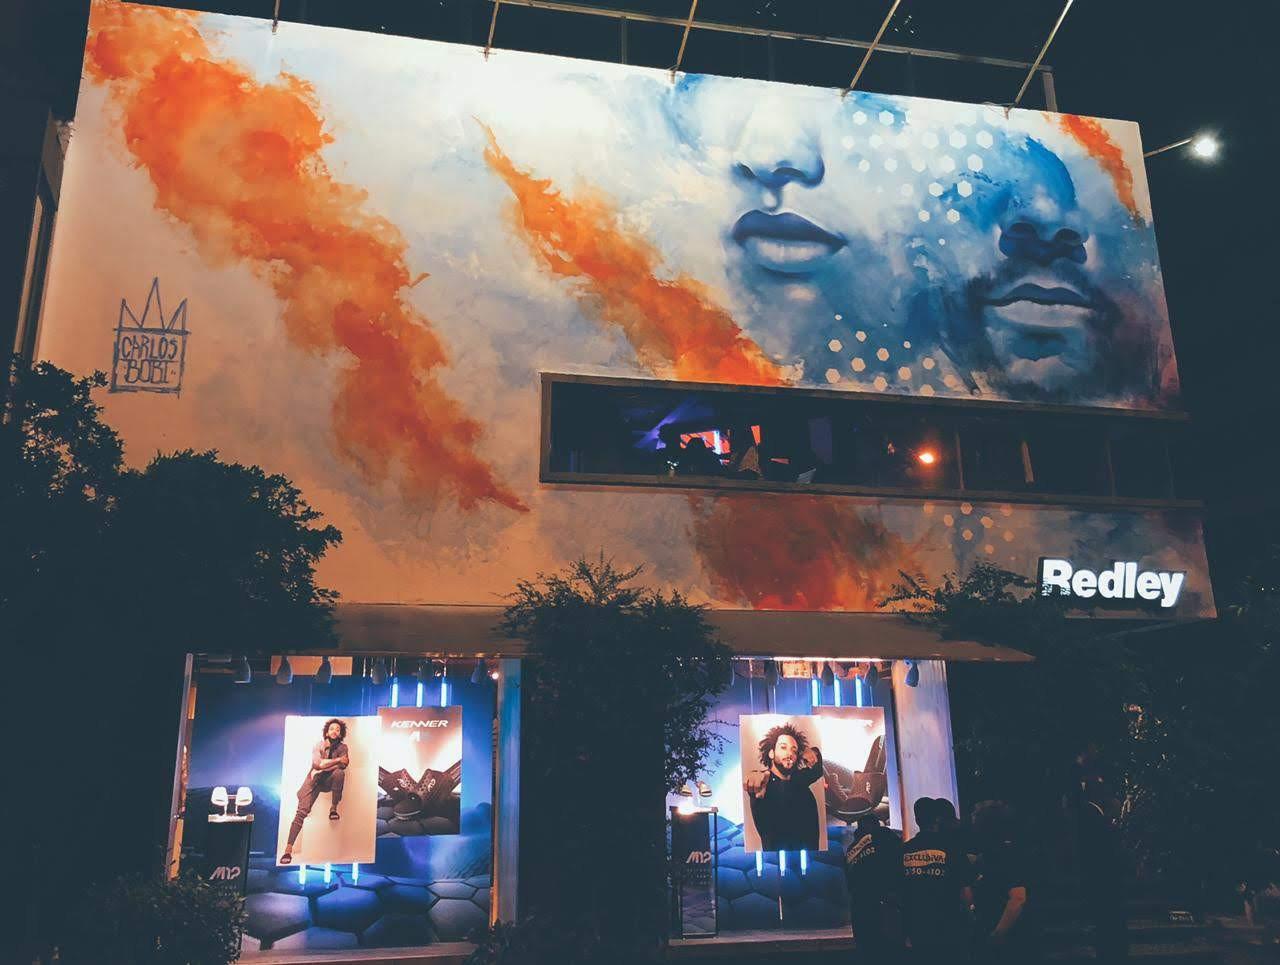 Ipanema Wall - Redley - 2019.